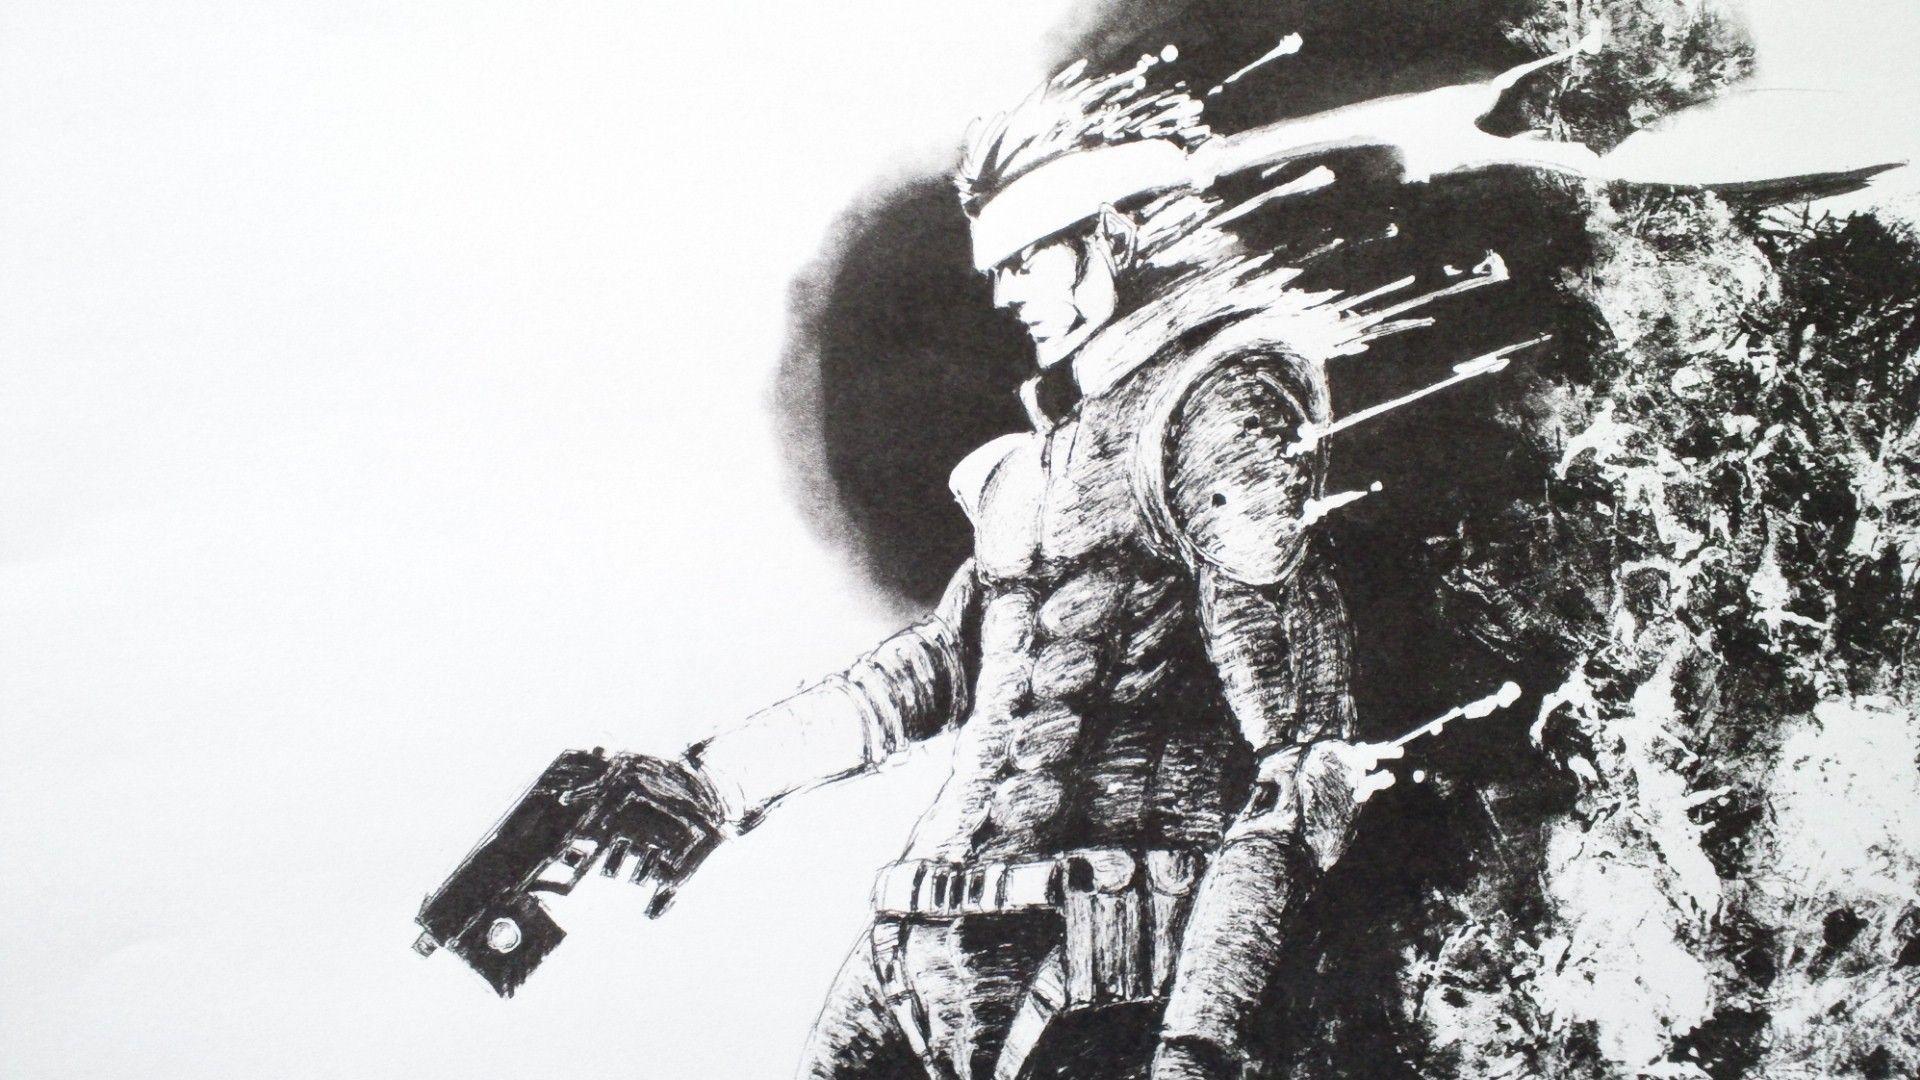 Metal Gear Solid Wallpapers HD - Wallpaper Cave